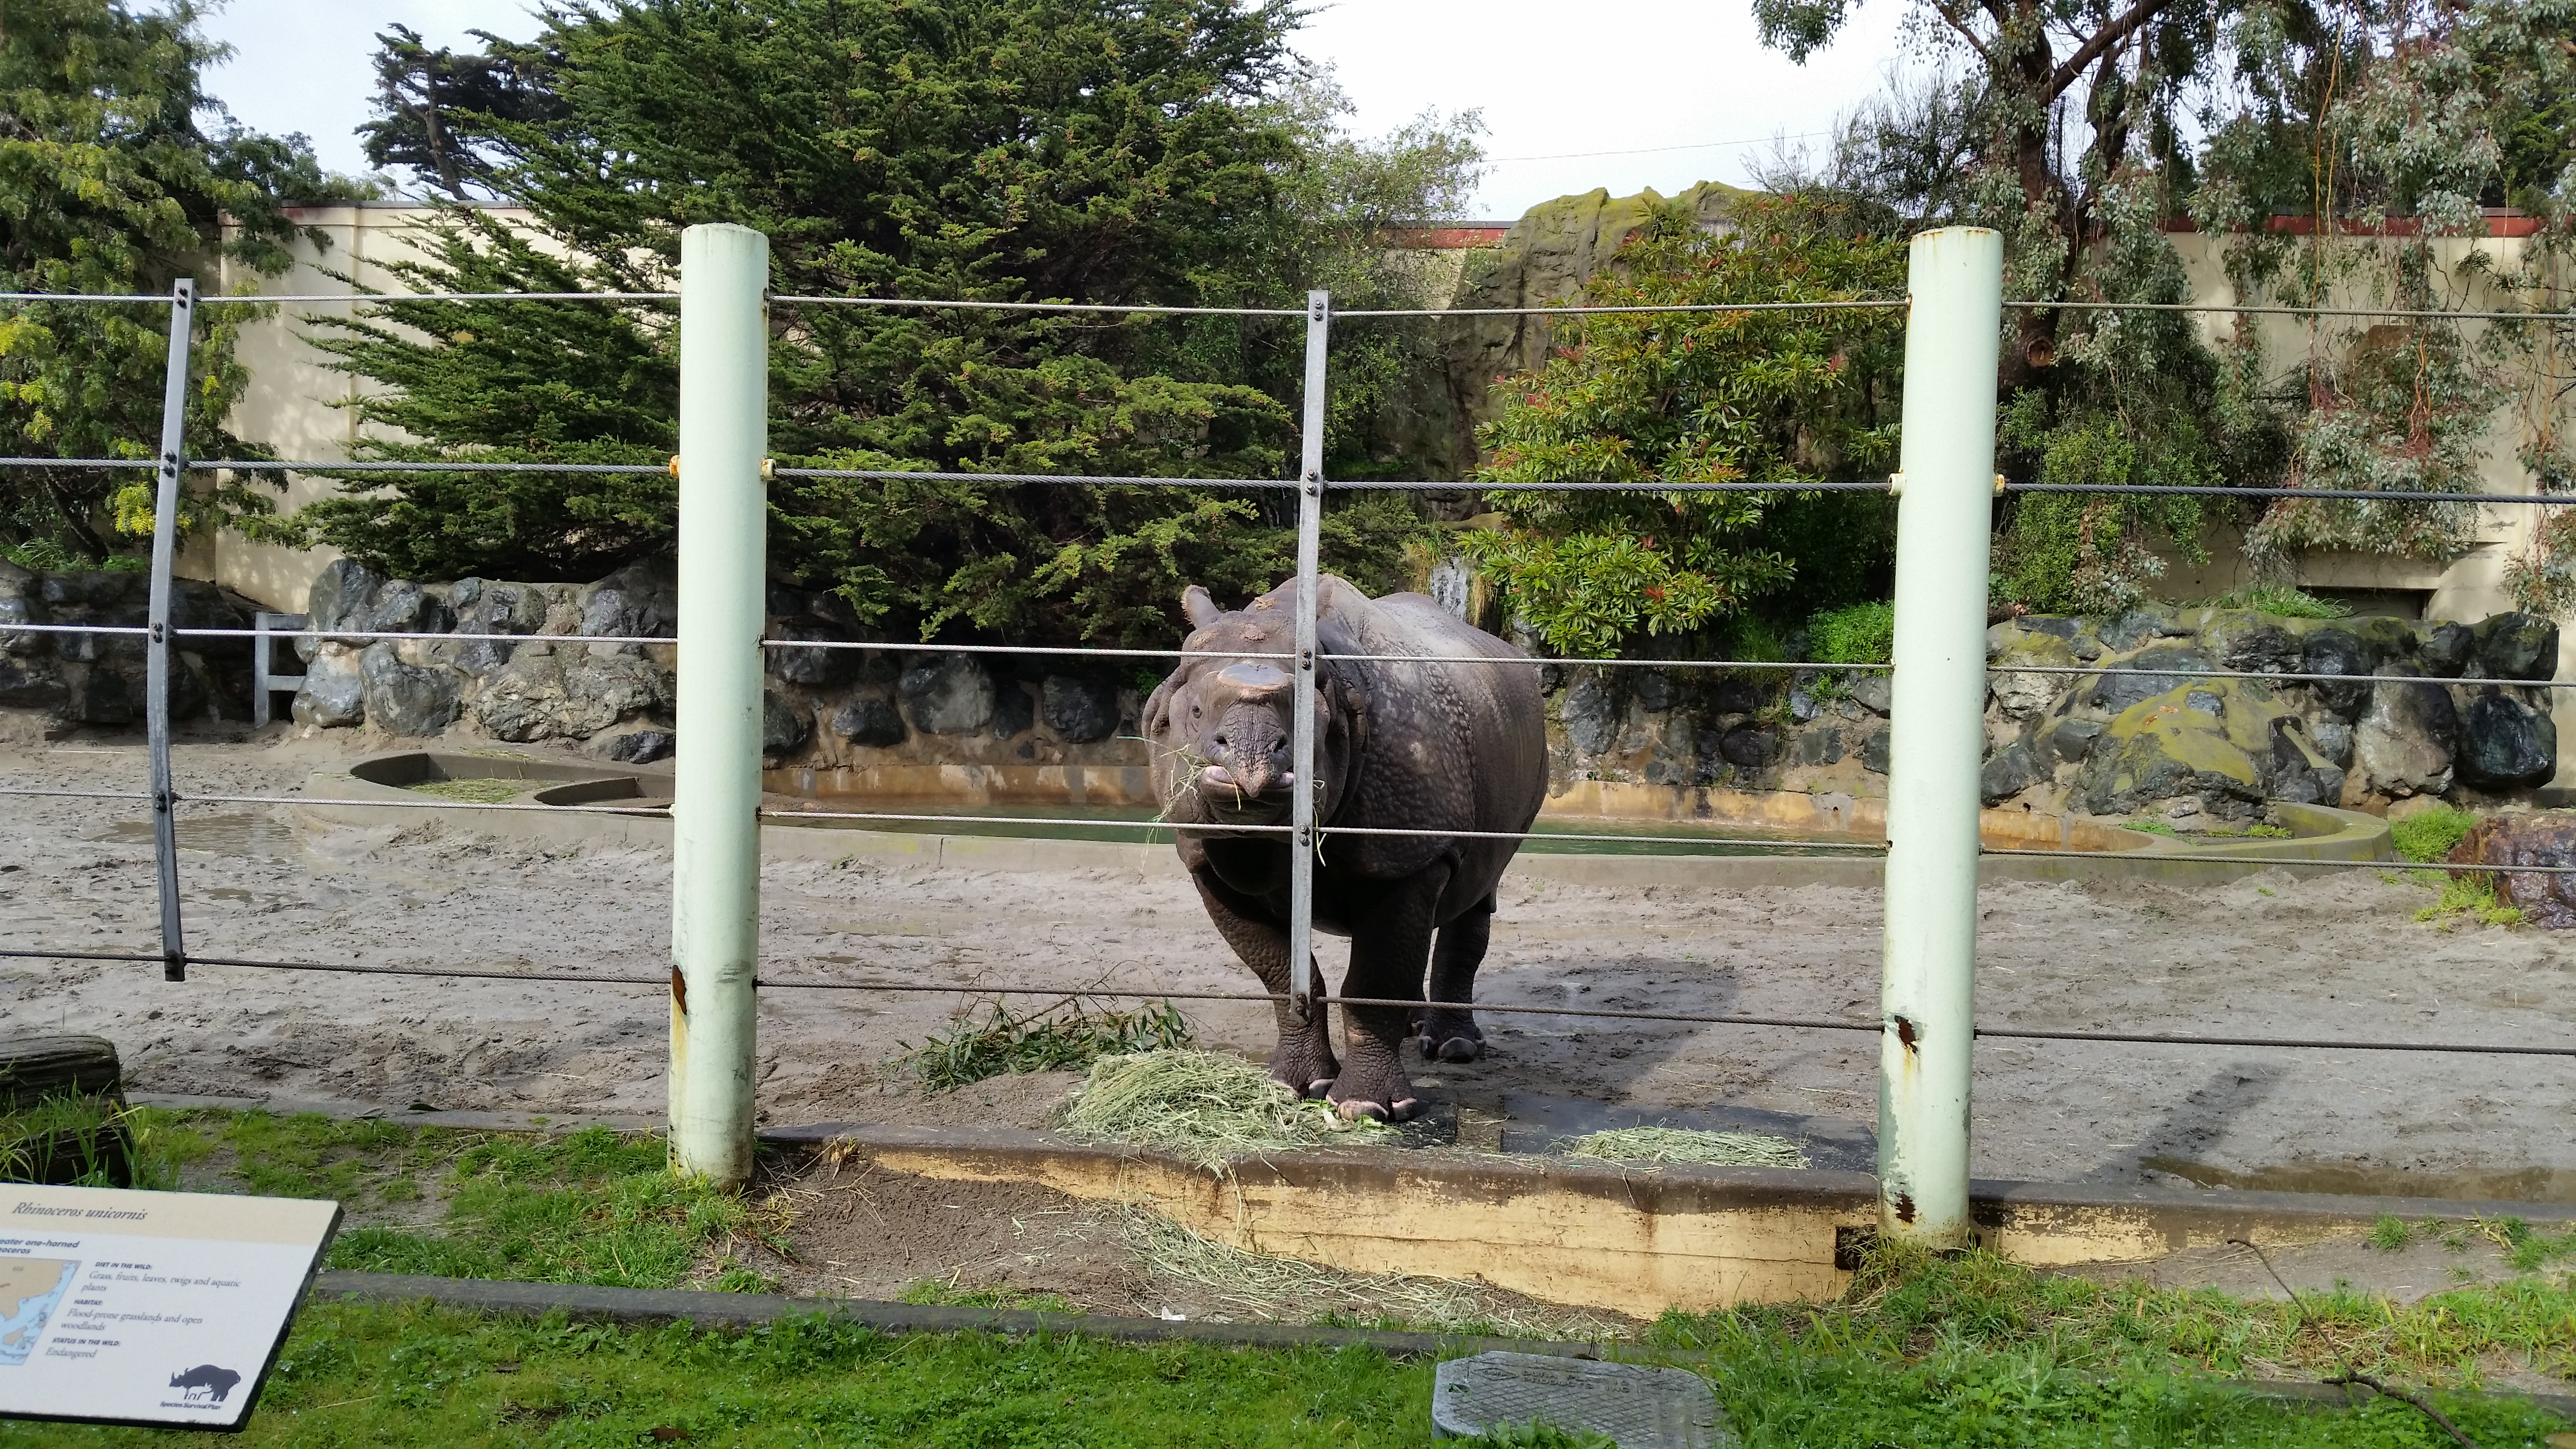 File:Indian Rhino at the San Francisco Zoo 03 jpg